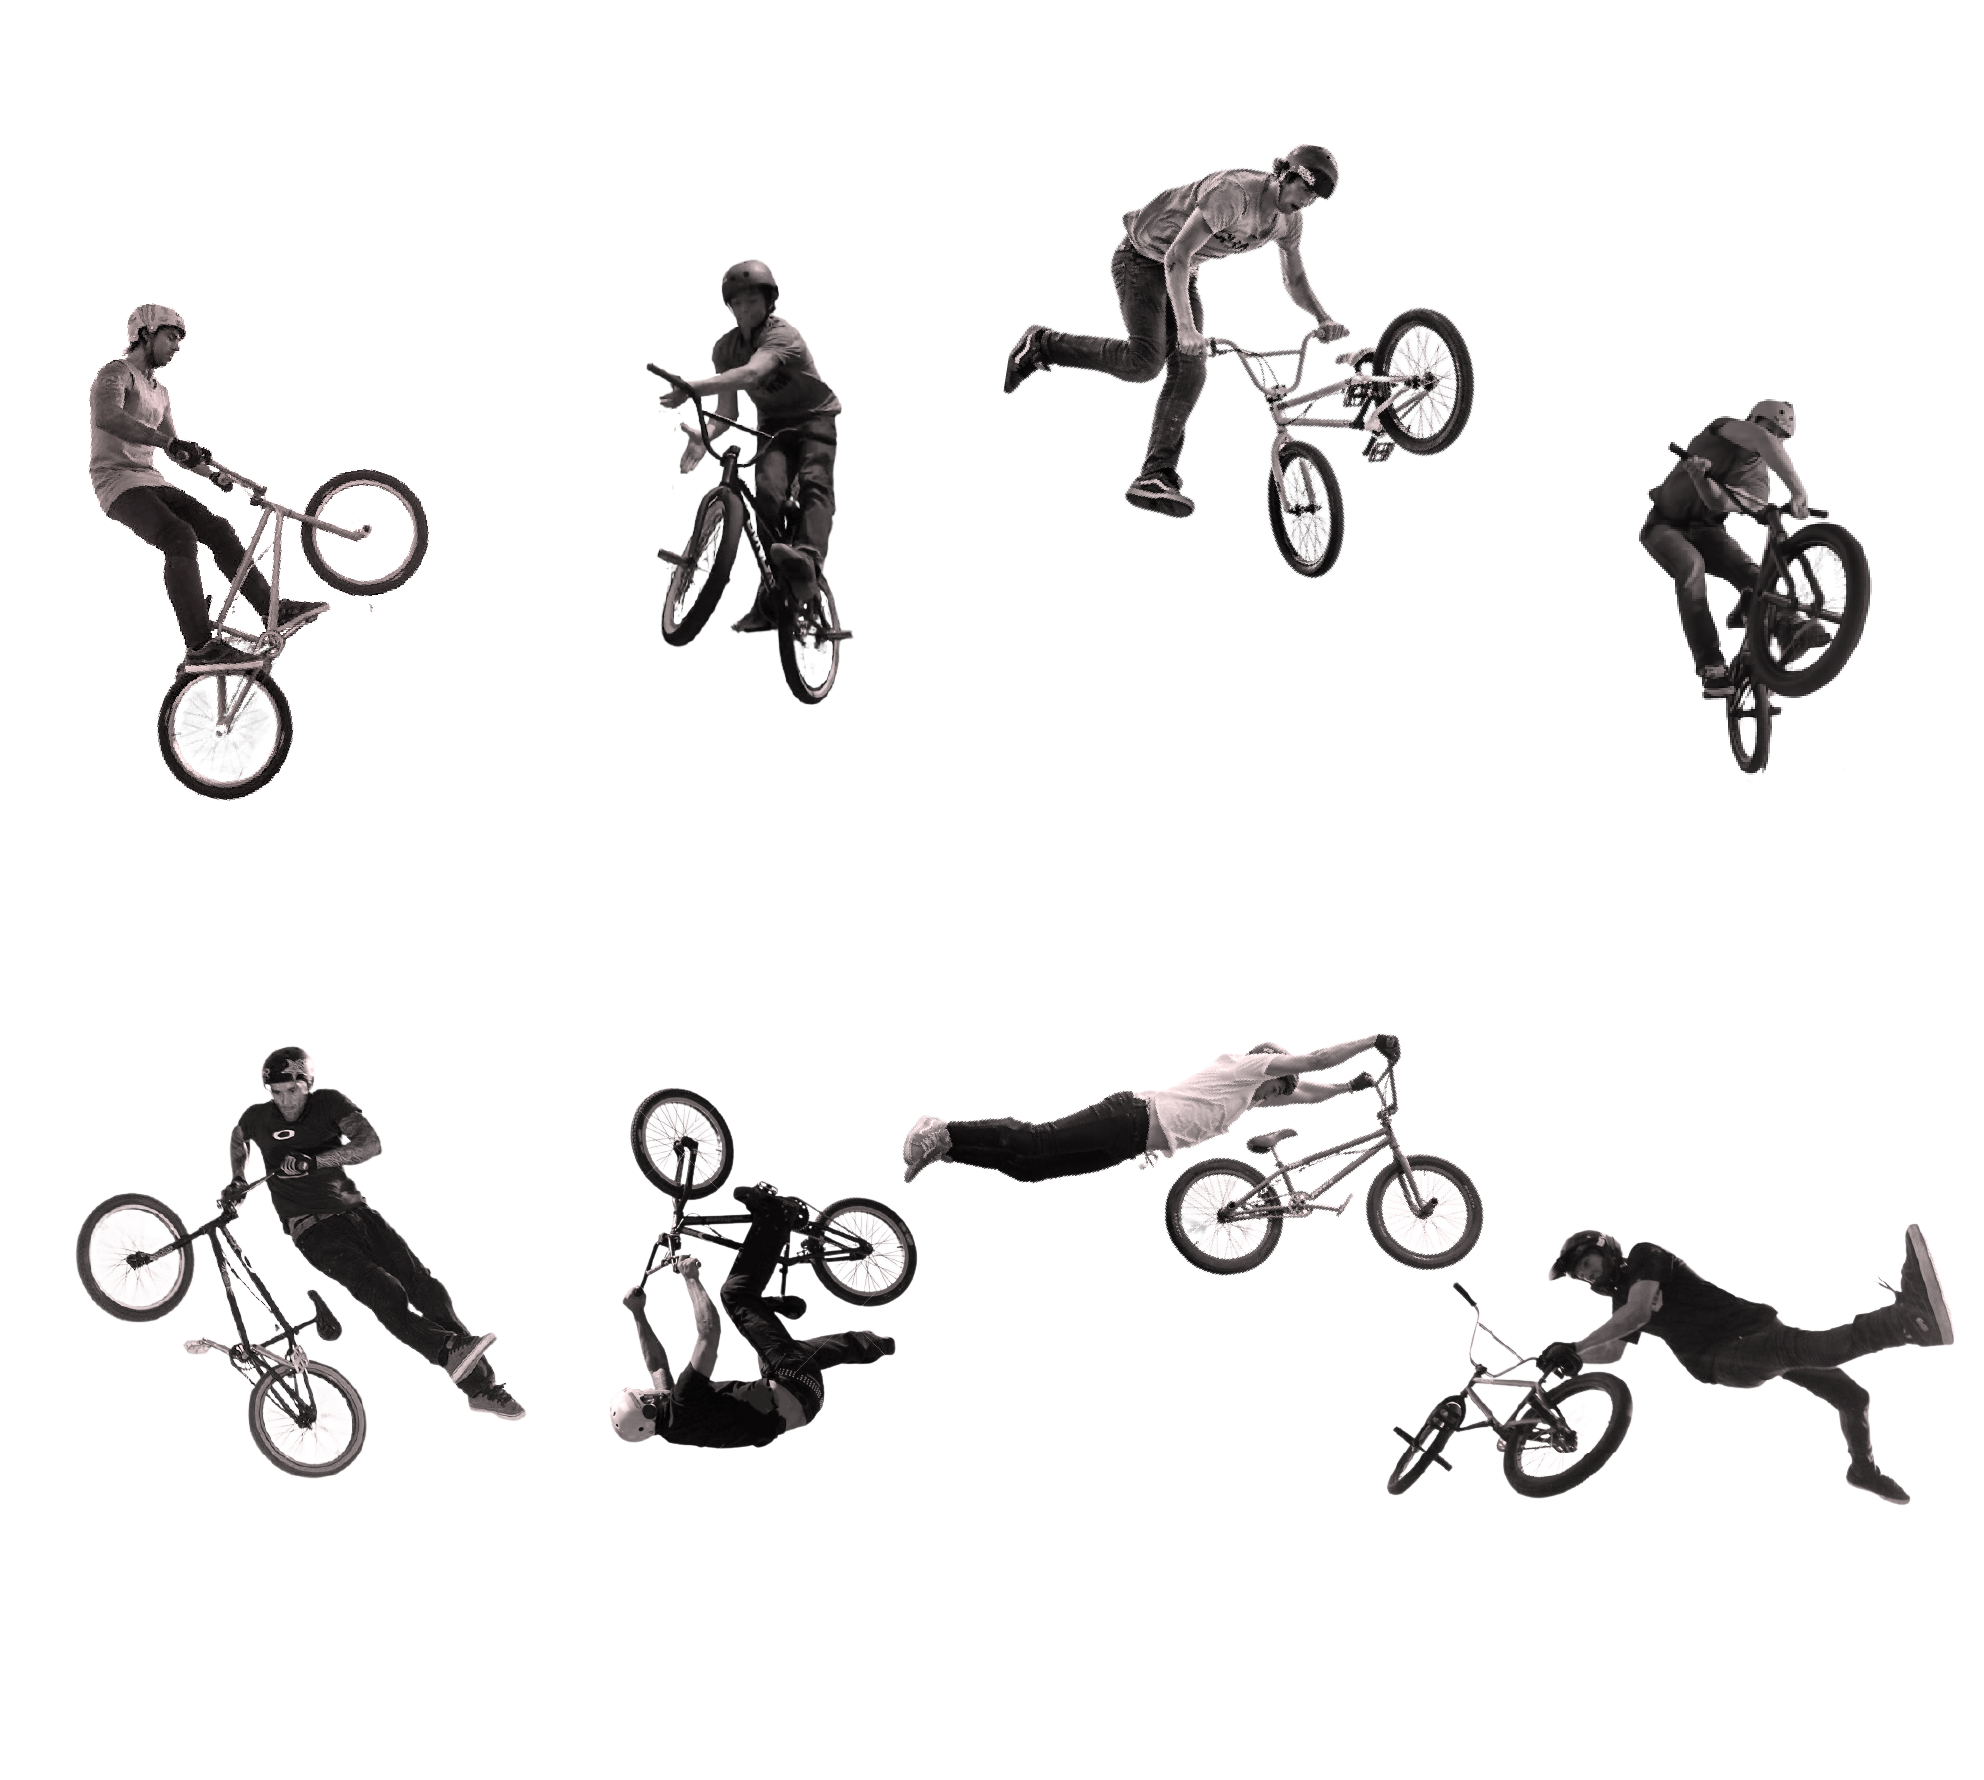 ciclismo-bmx-freestyle